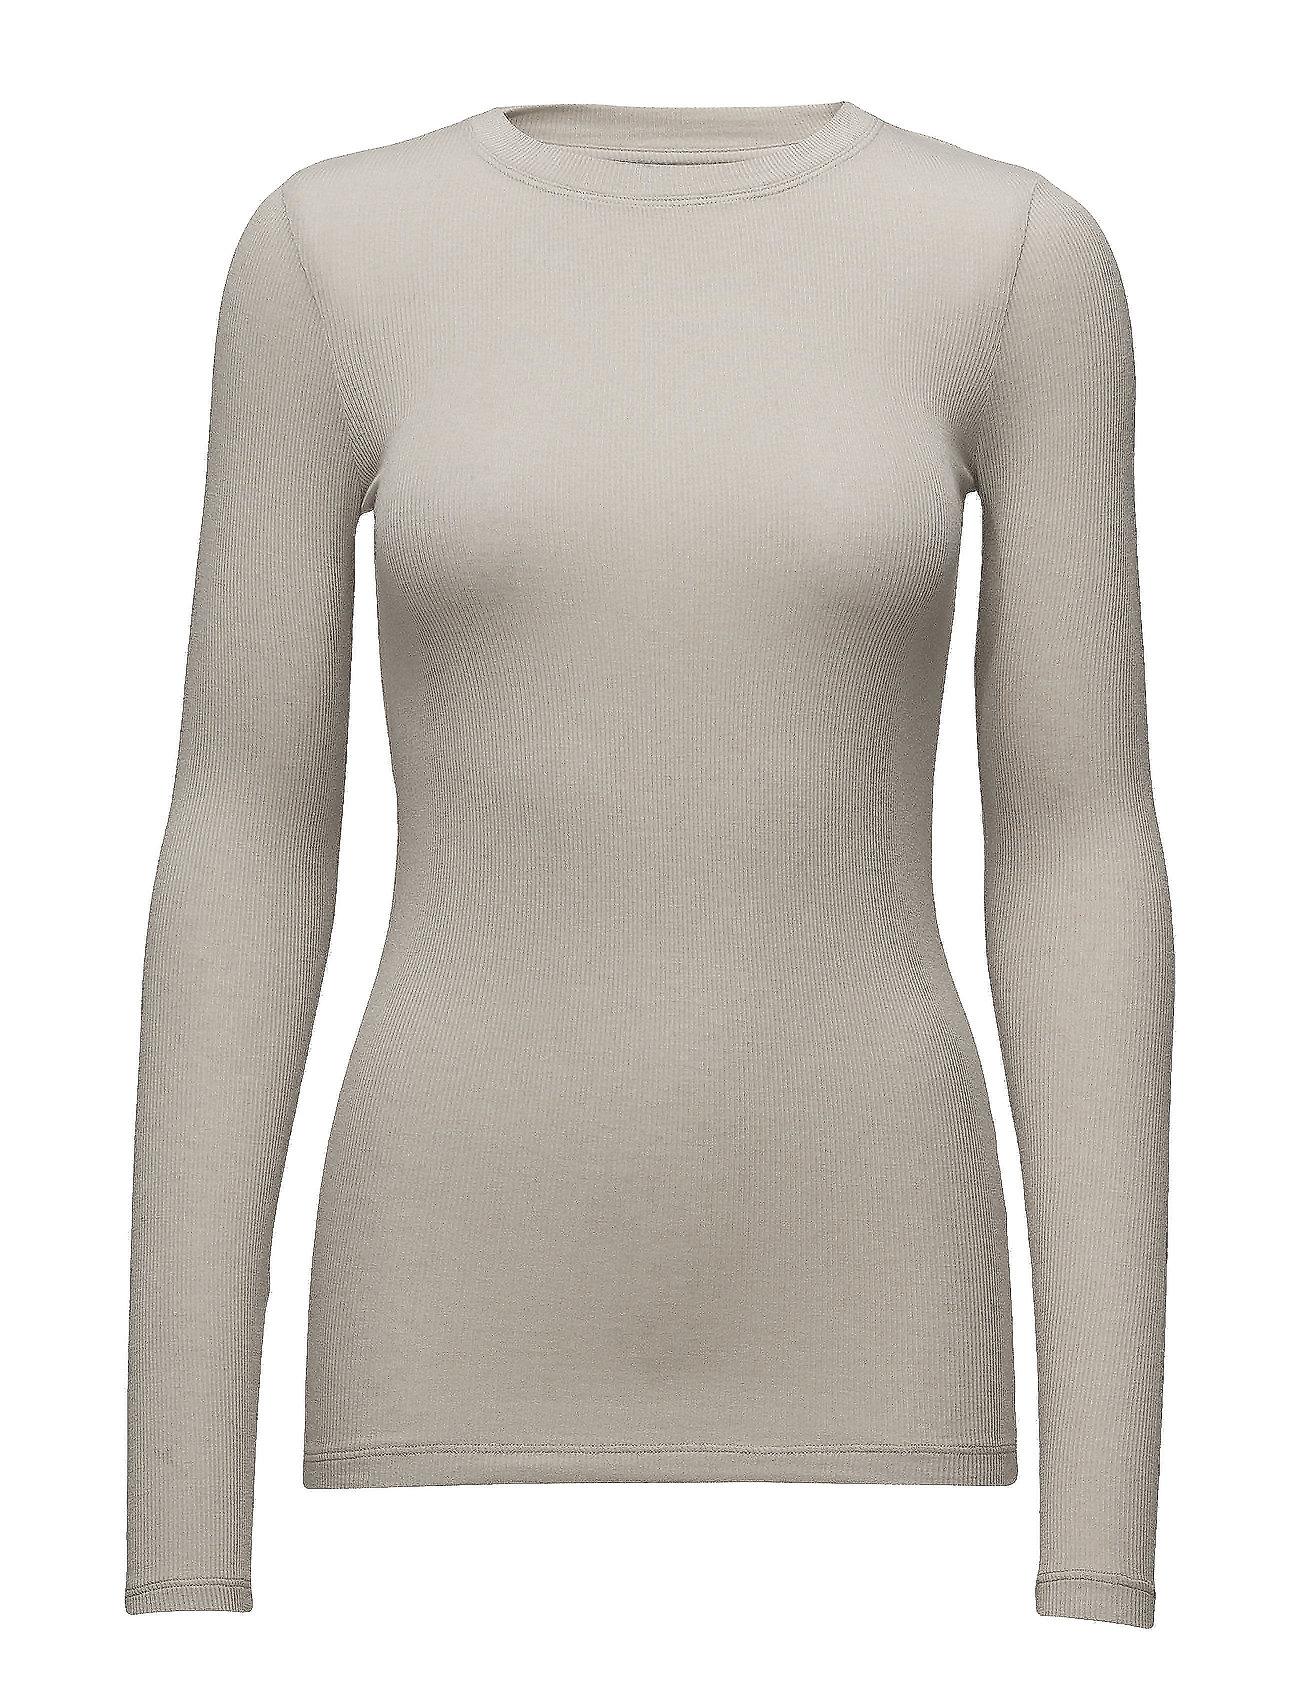 Bruuns Bazaar Angela LS T-shirt - LIGHT GREY PORPOISE